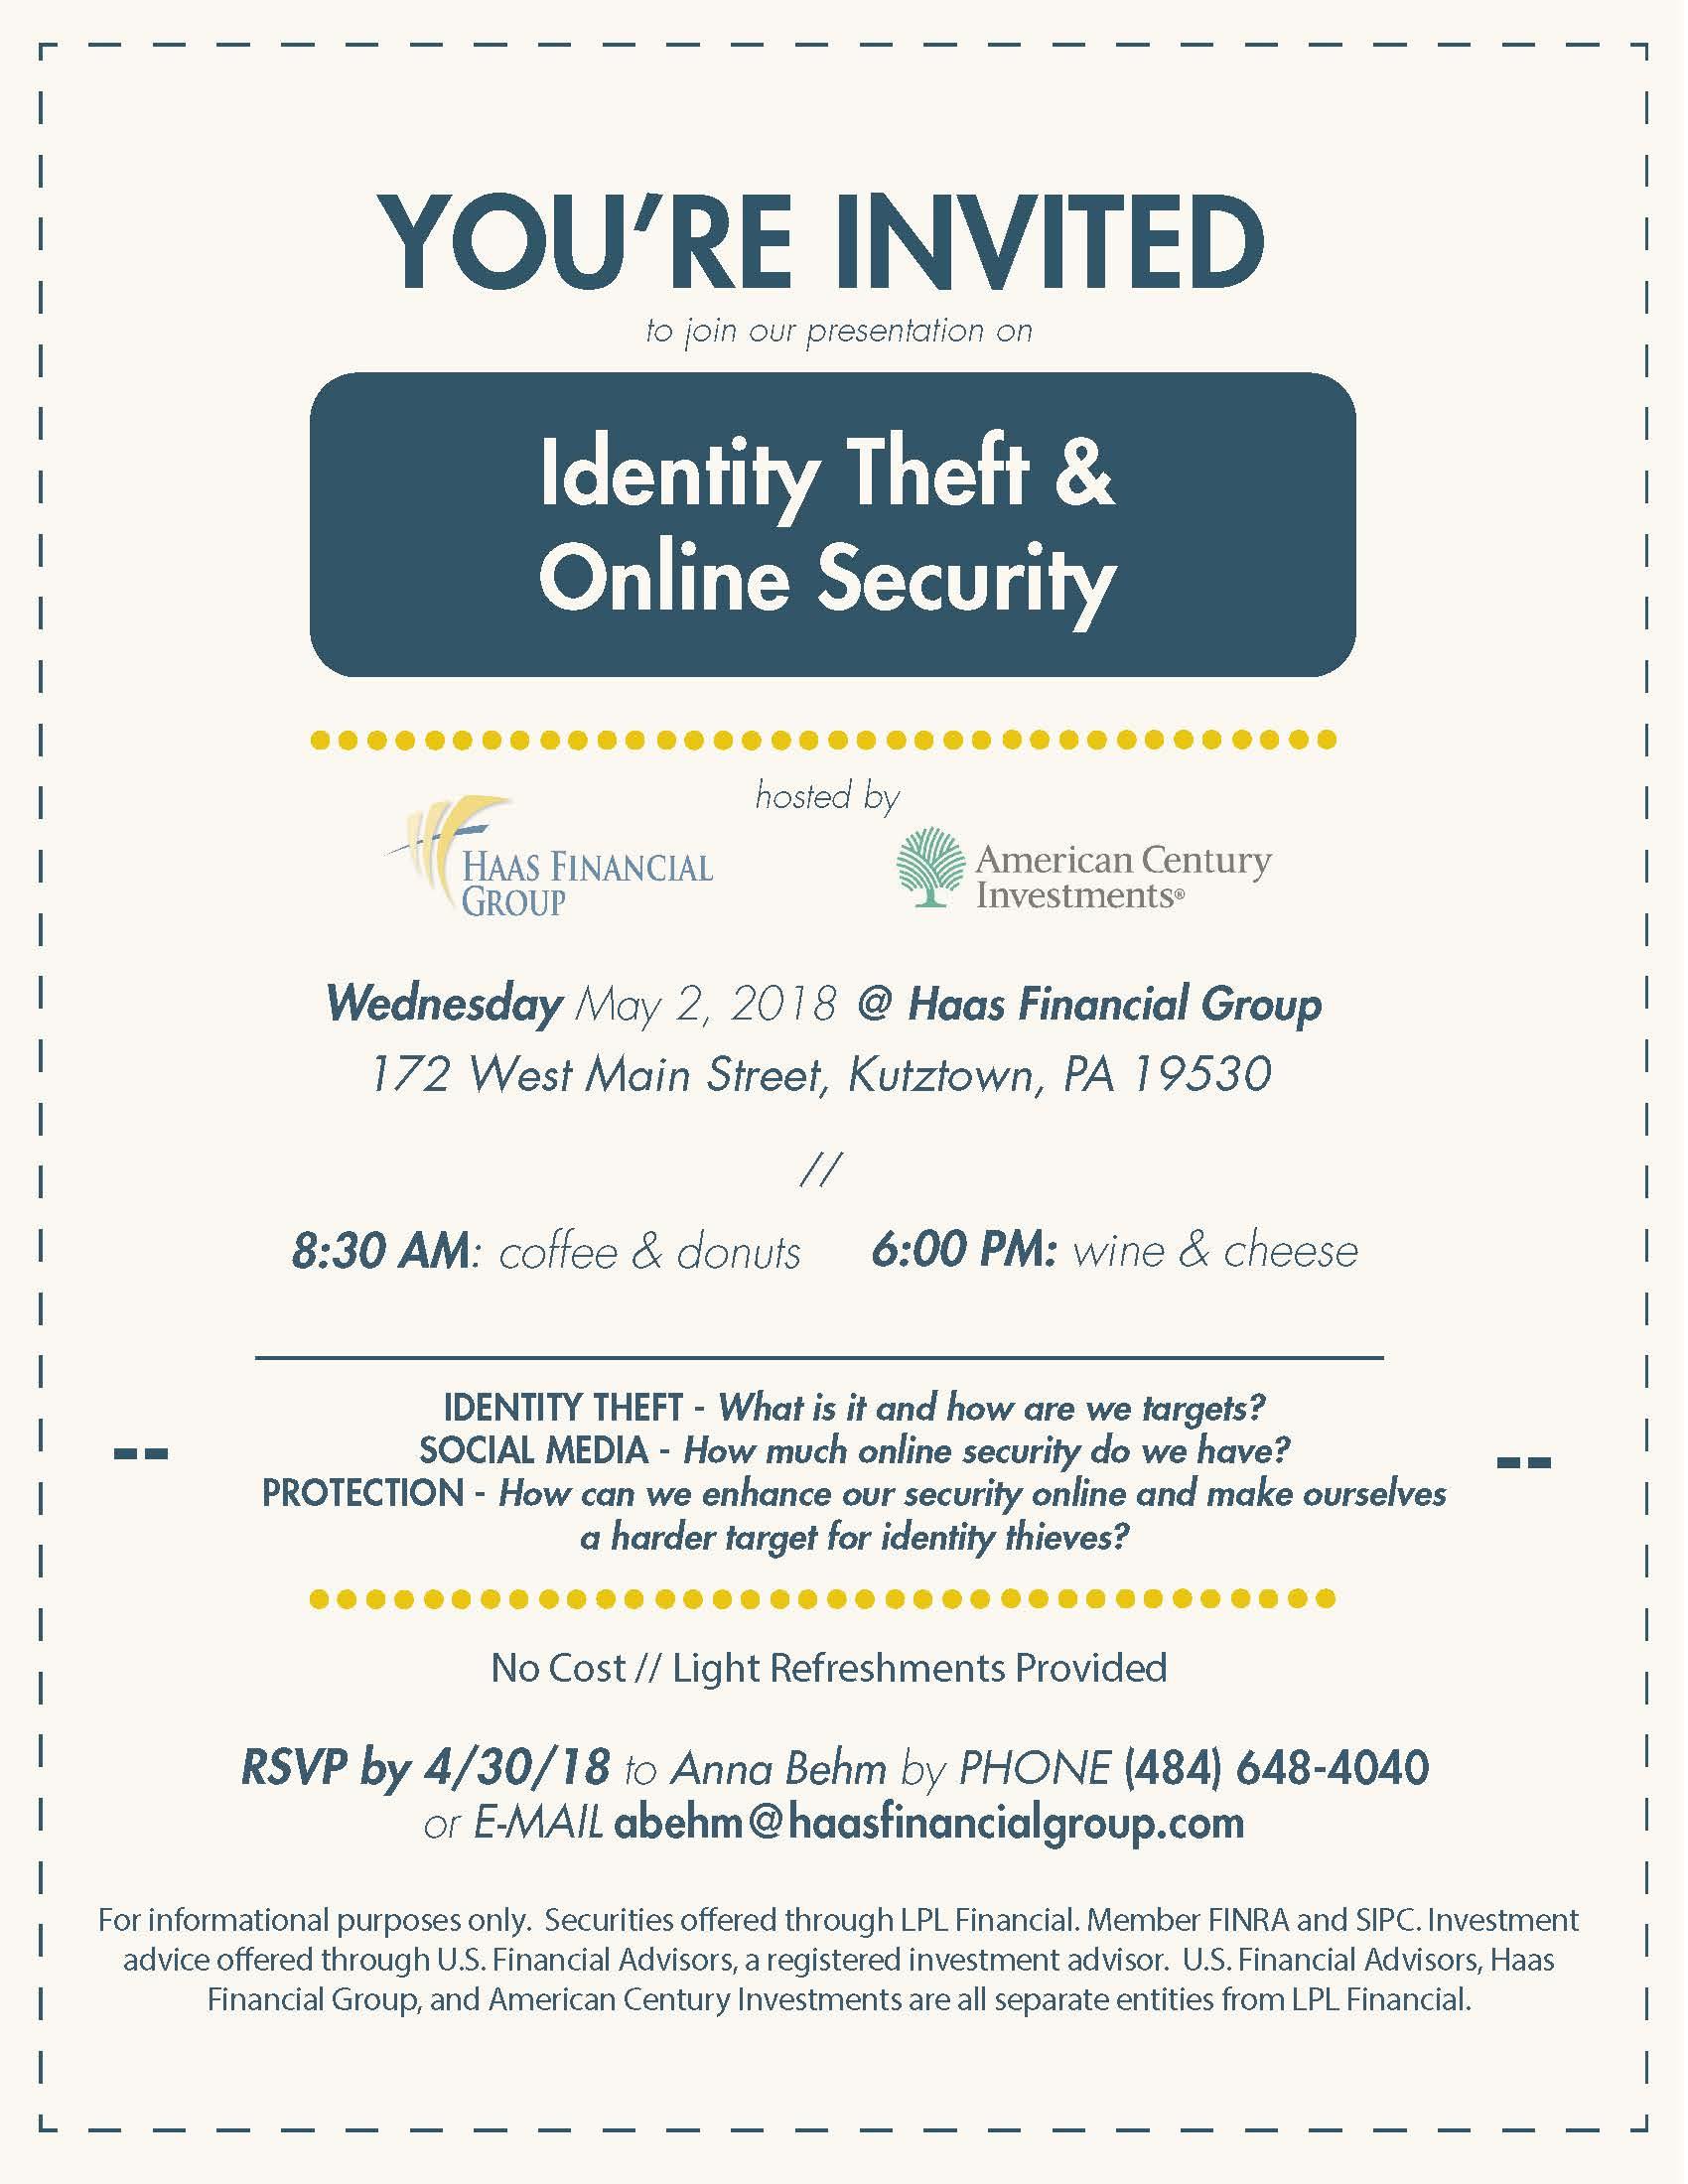 Identity Theft & Online Security.jpg